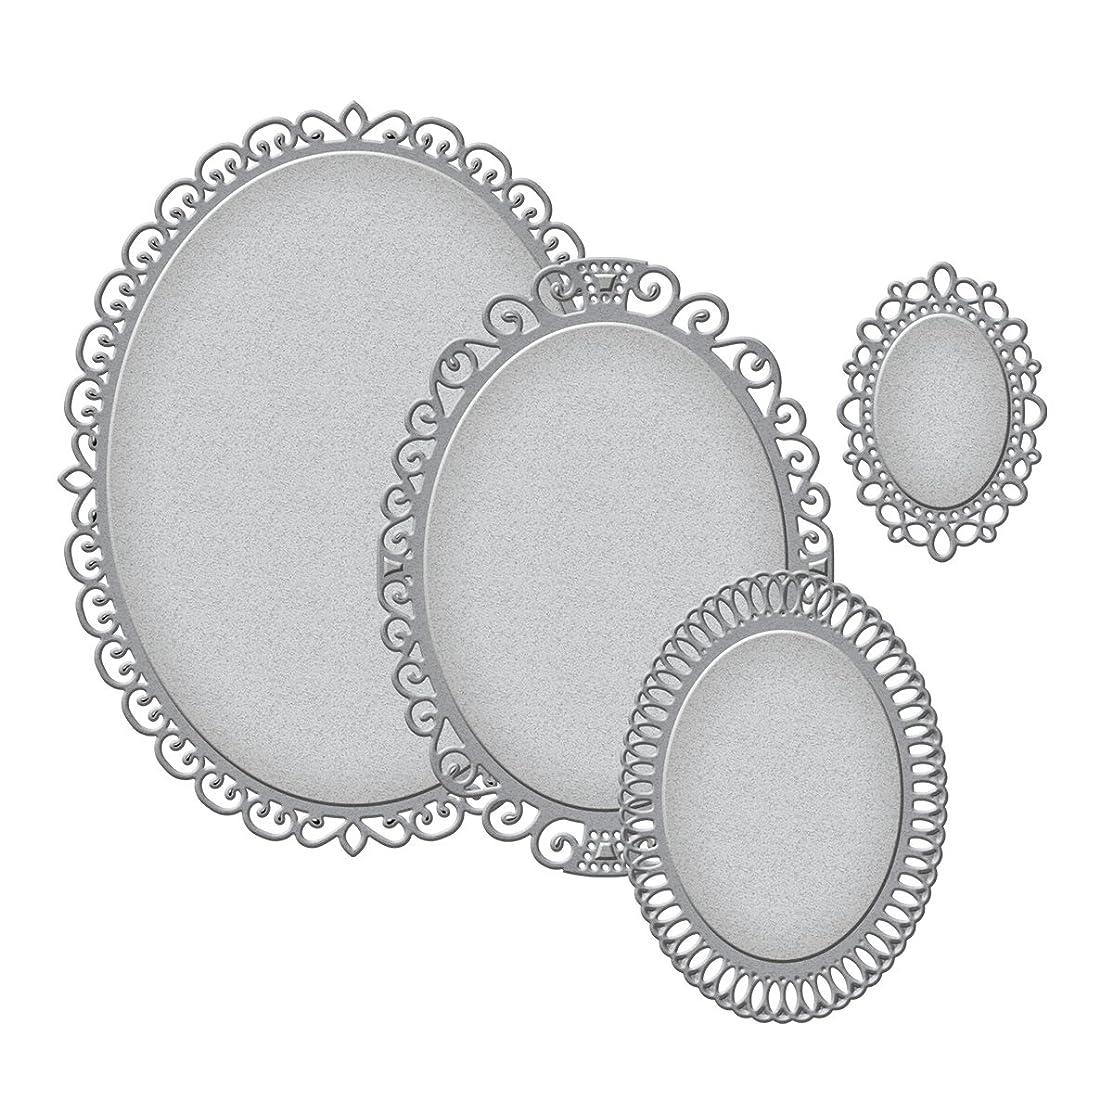 Spellbinders S4-425 Nestabilities Elegant Ovals Etched/Wafer Thin Dies